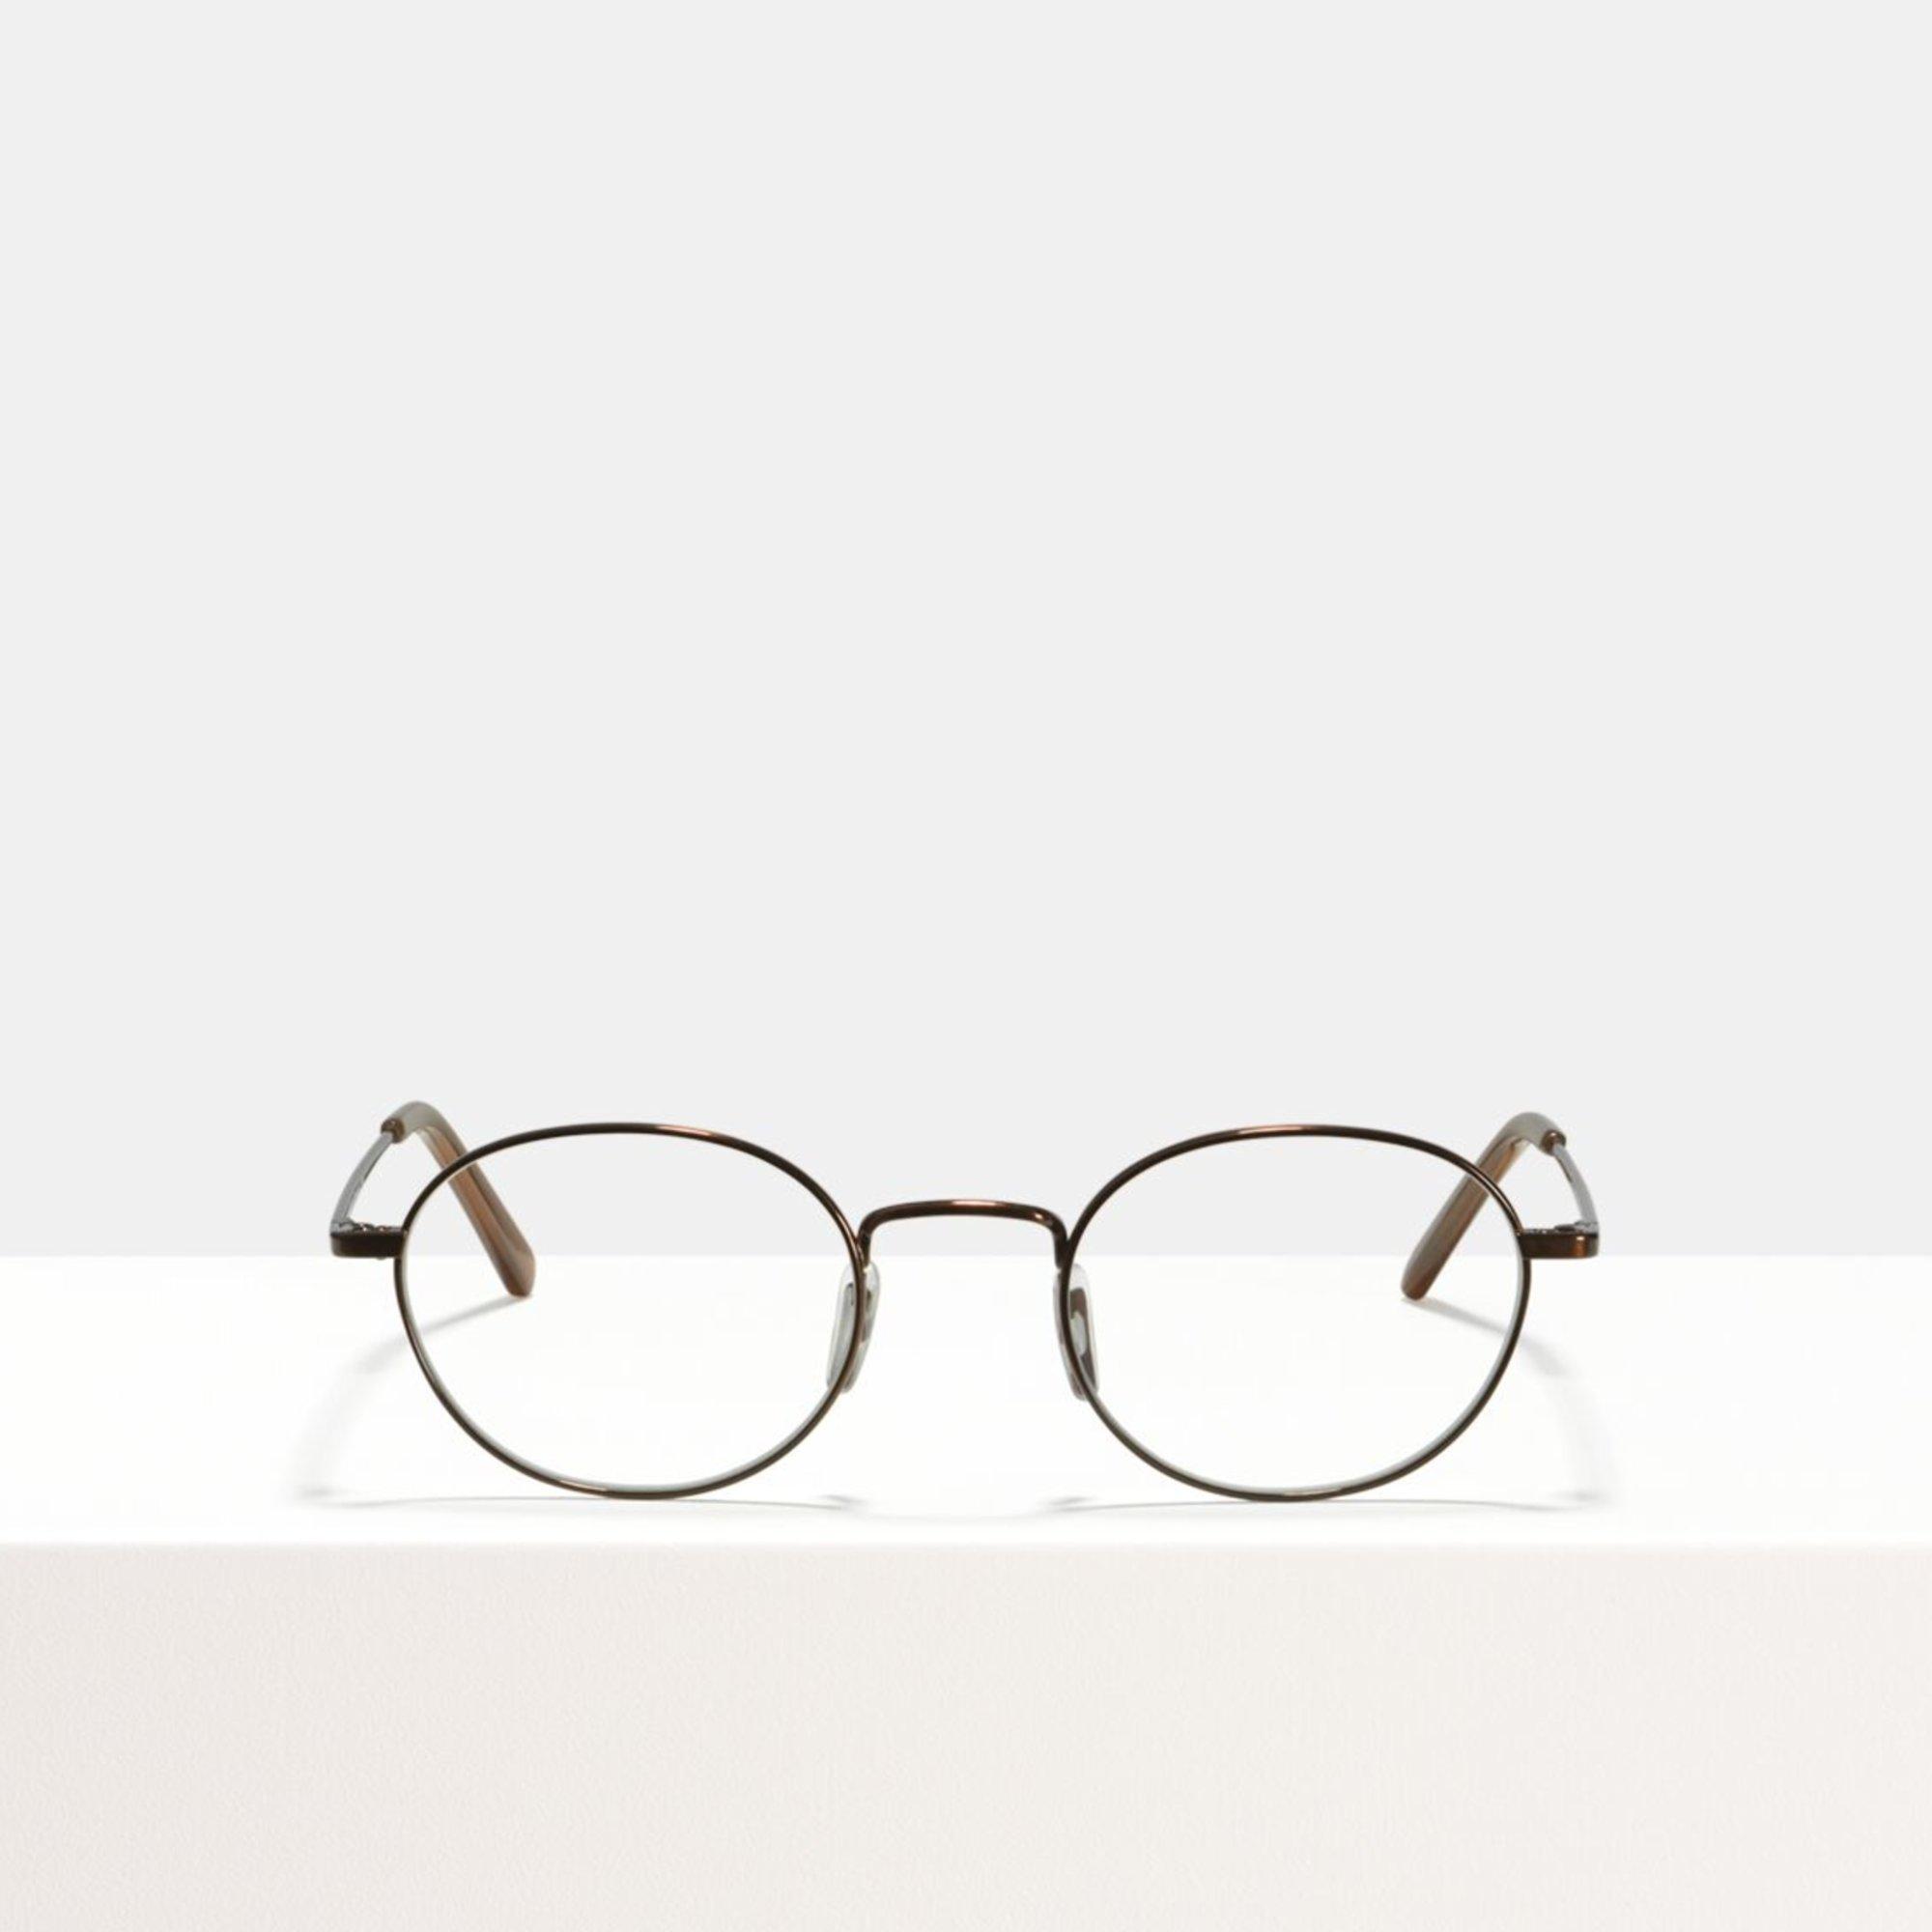 Ace & Tate Glasses |  titanium in Brown